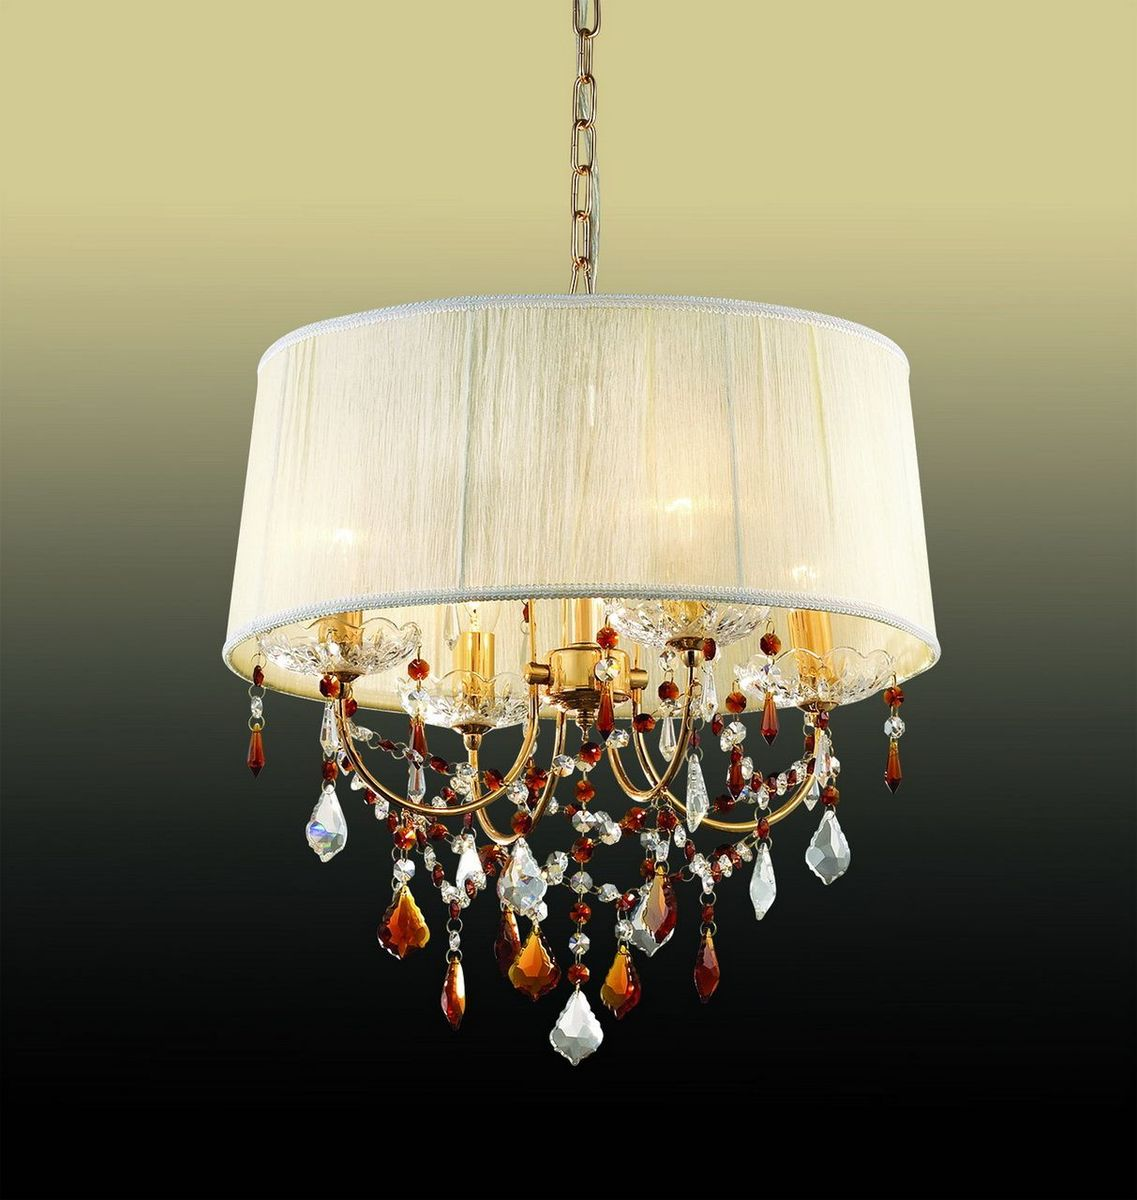 Люстра подвесная Odeon Light Adeli, 4 х E14, 40W. 2534/42534/4